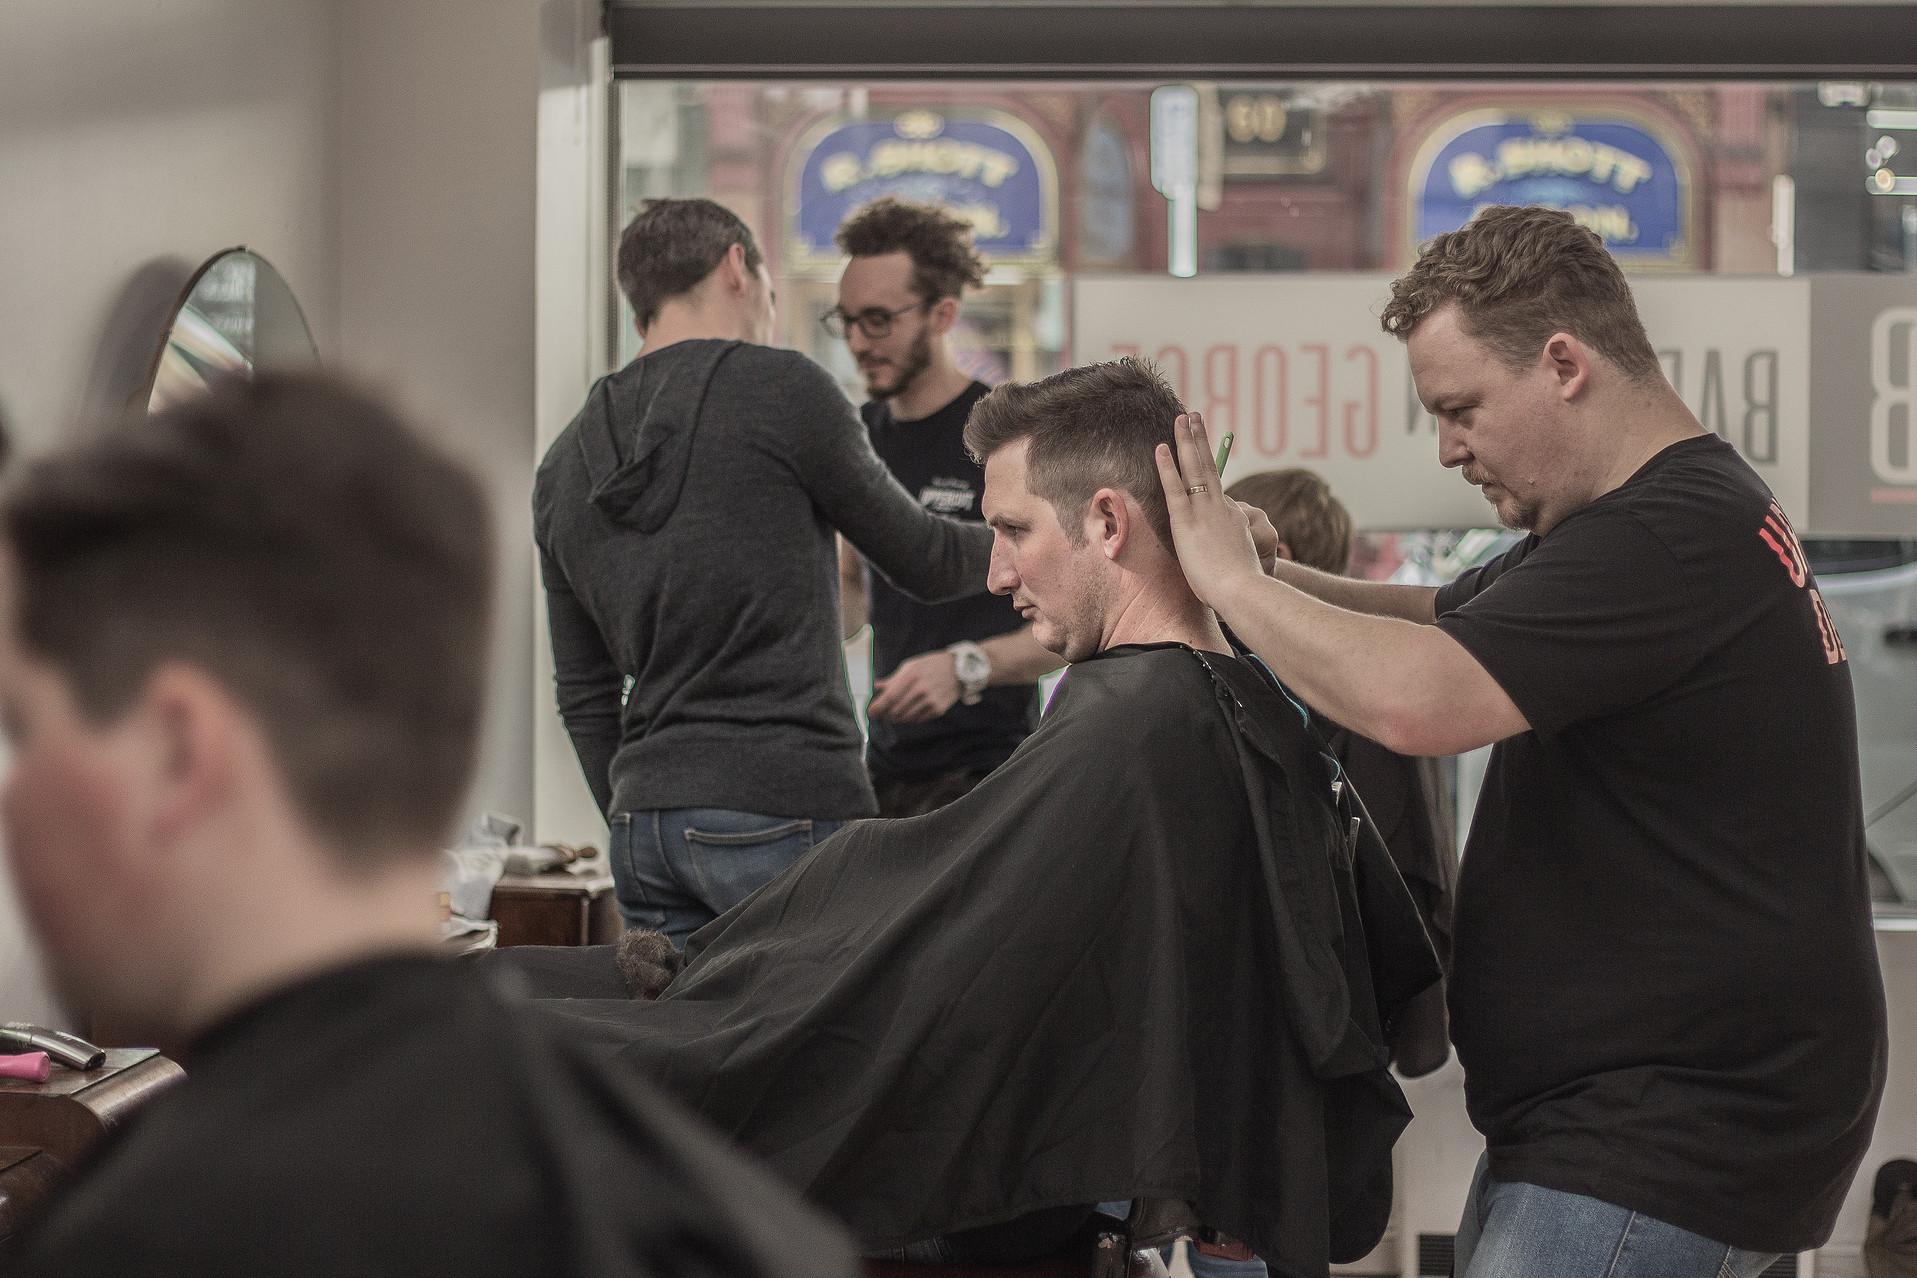 Barber on George | Launceston's Coolest Barber Shop